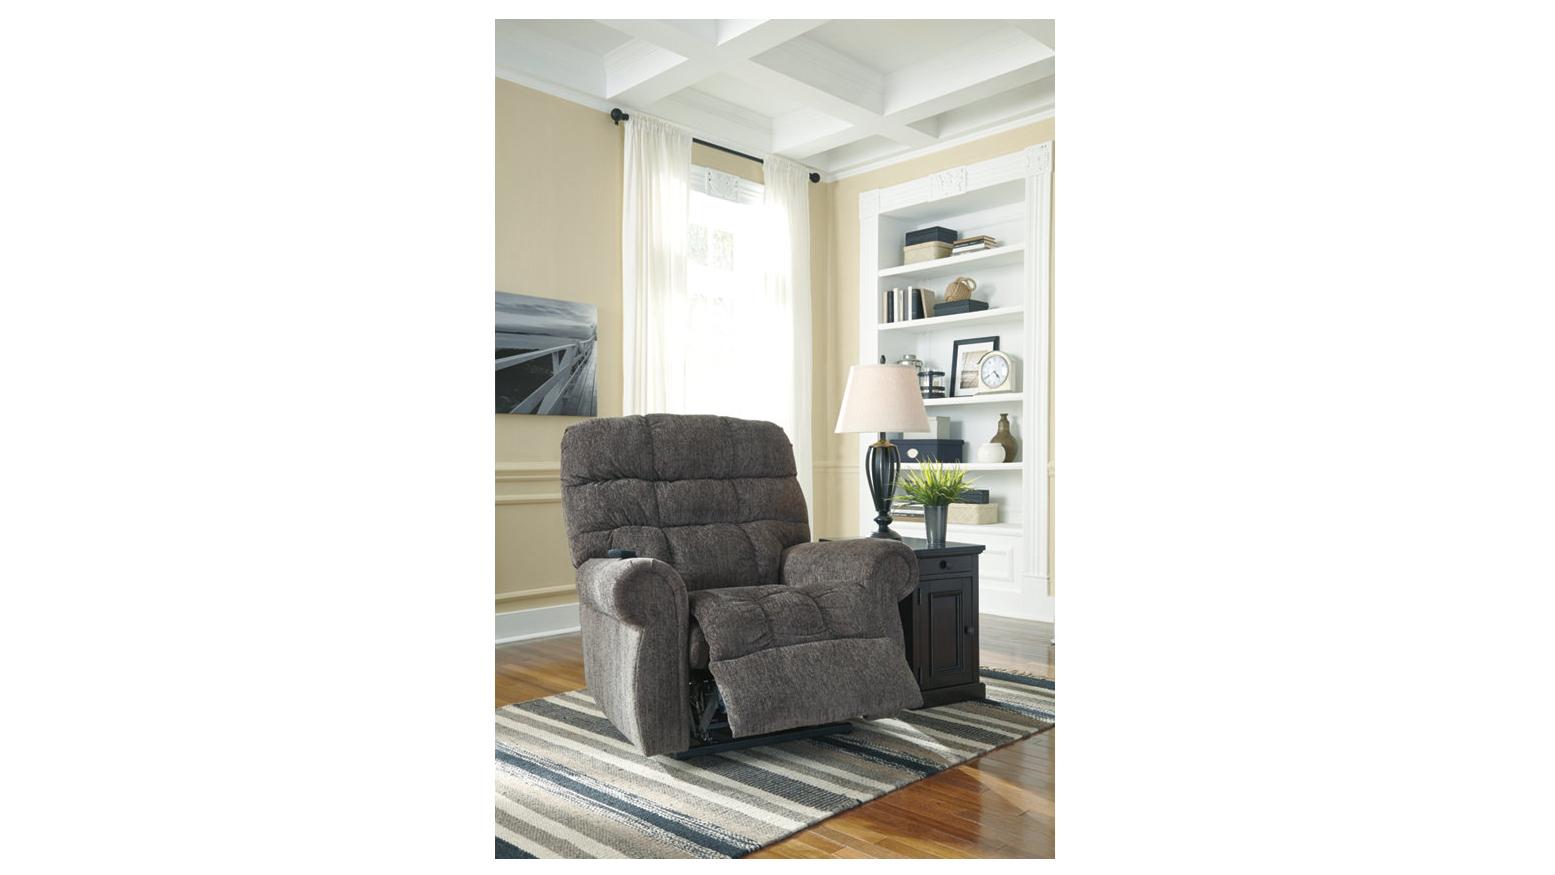 Ashley Ernestine power lift recliner